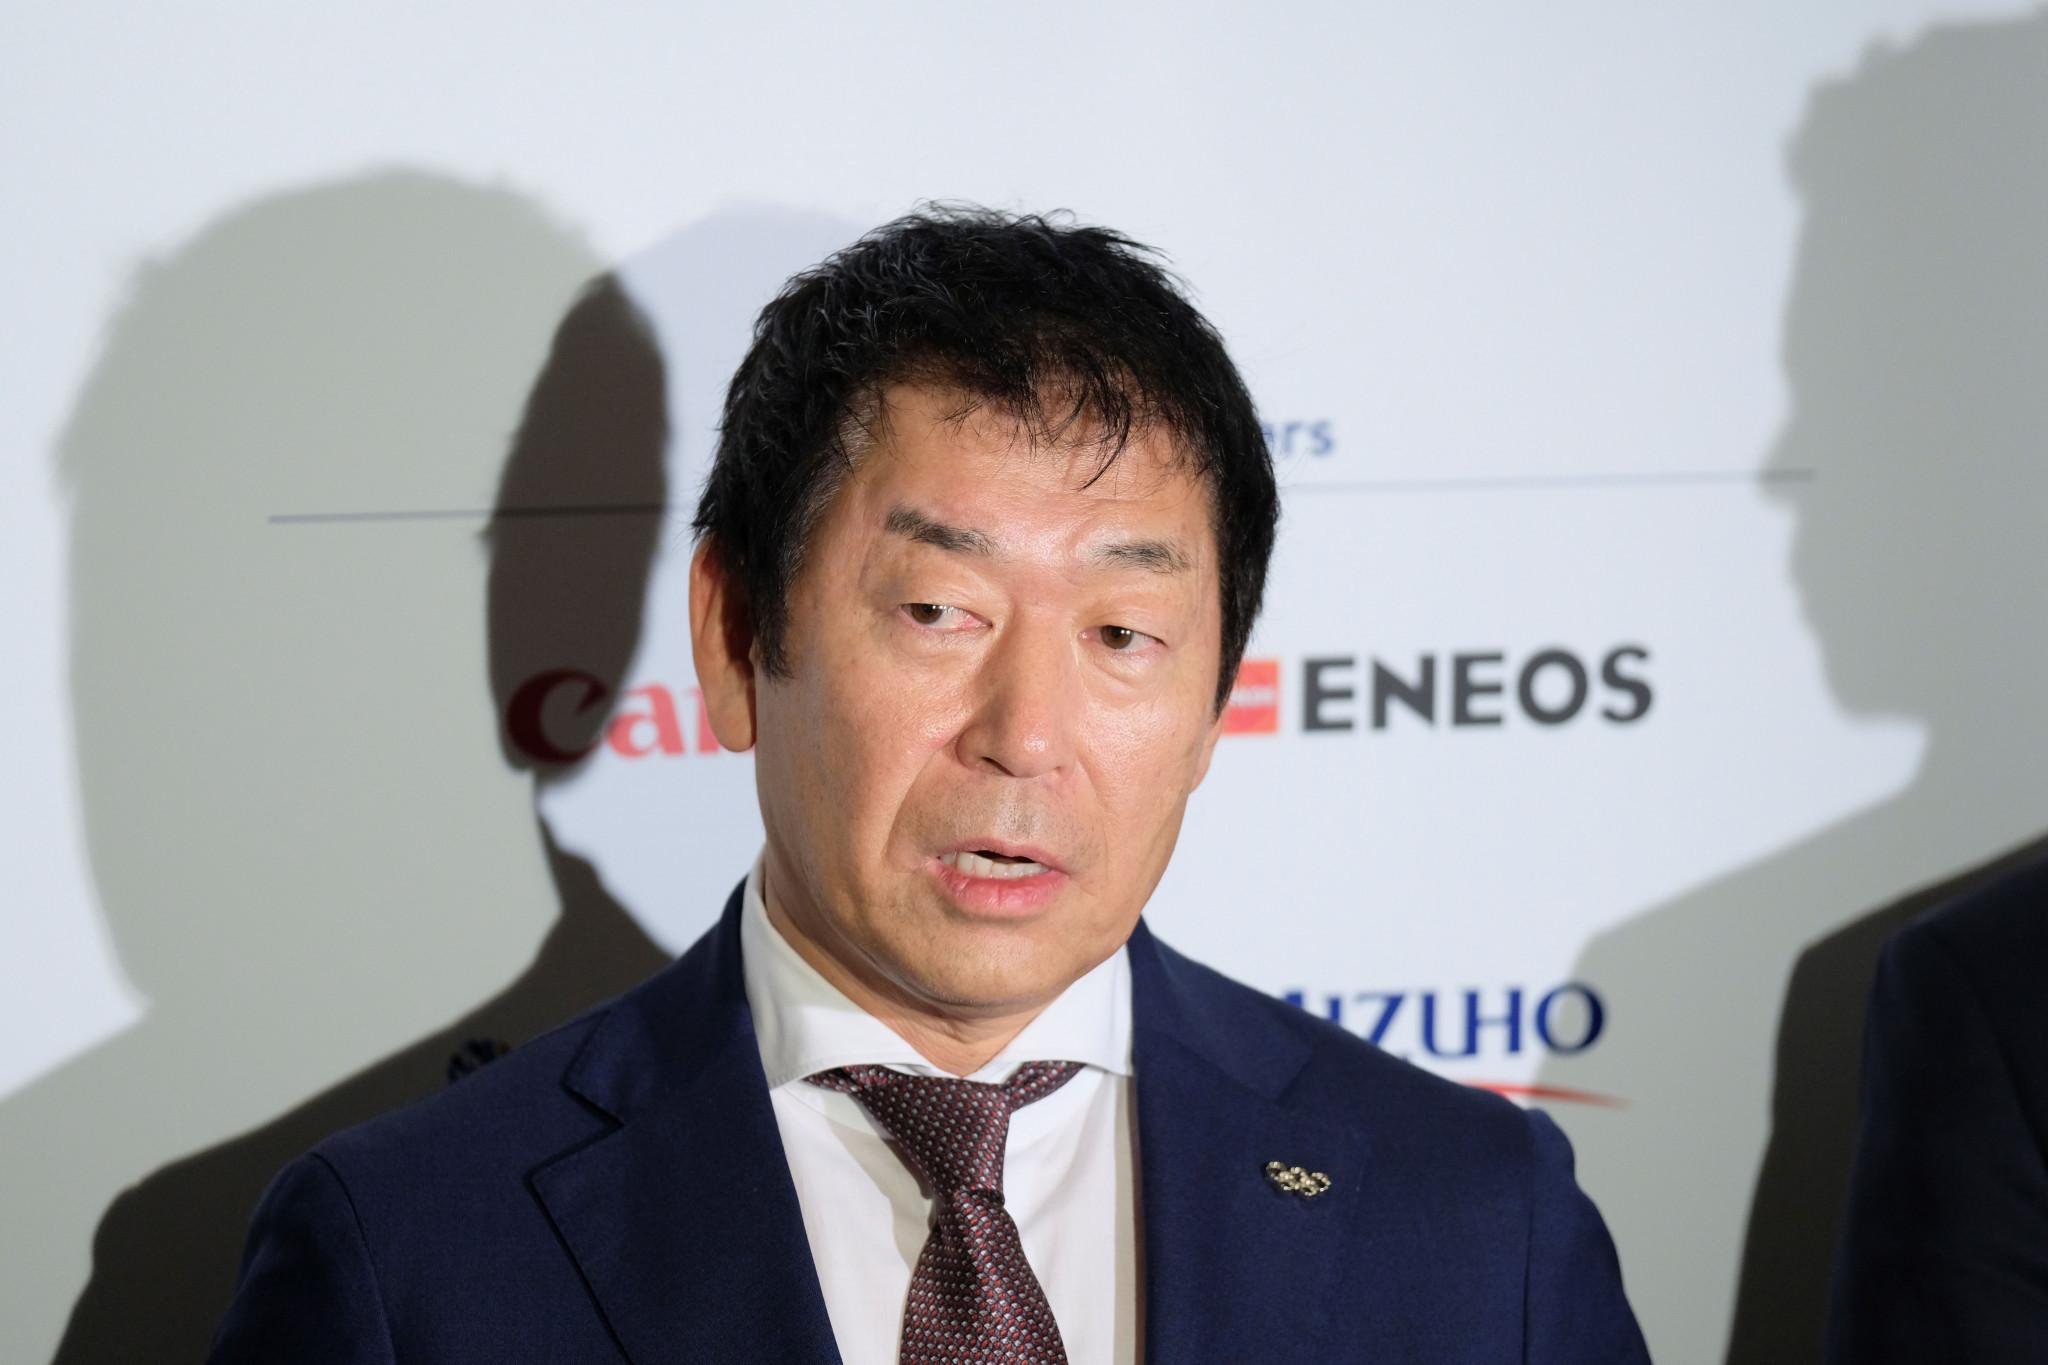 FIG President Morinari Watanabe reported that Uchimura had a